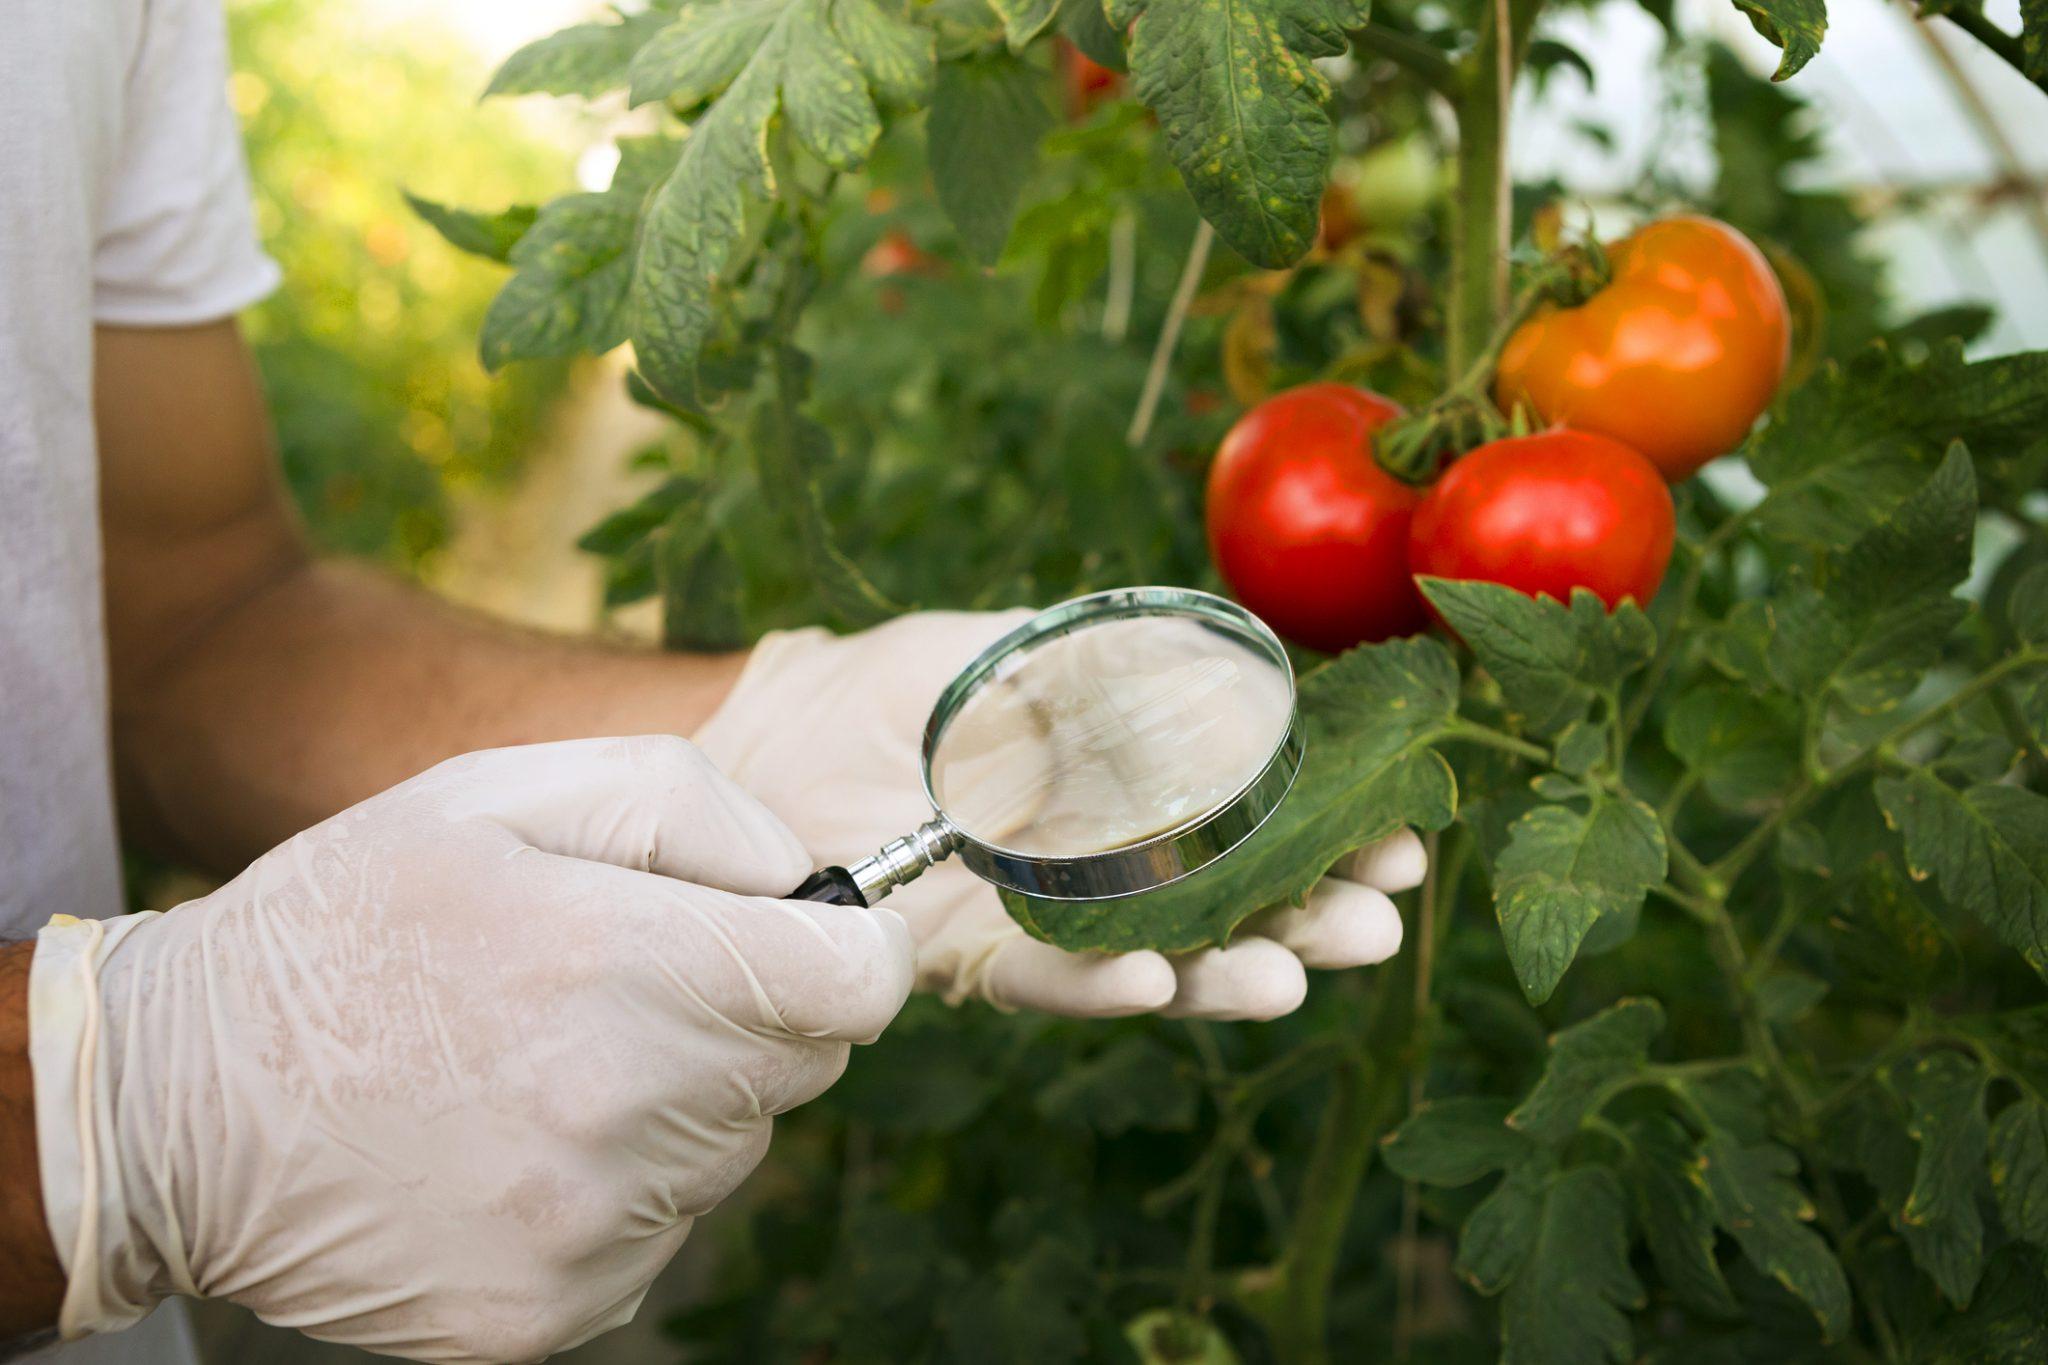 bugs in vegetable gardens